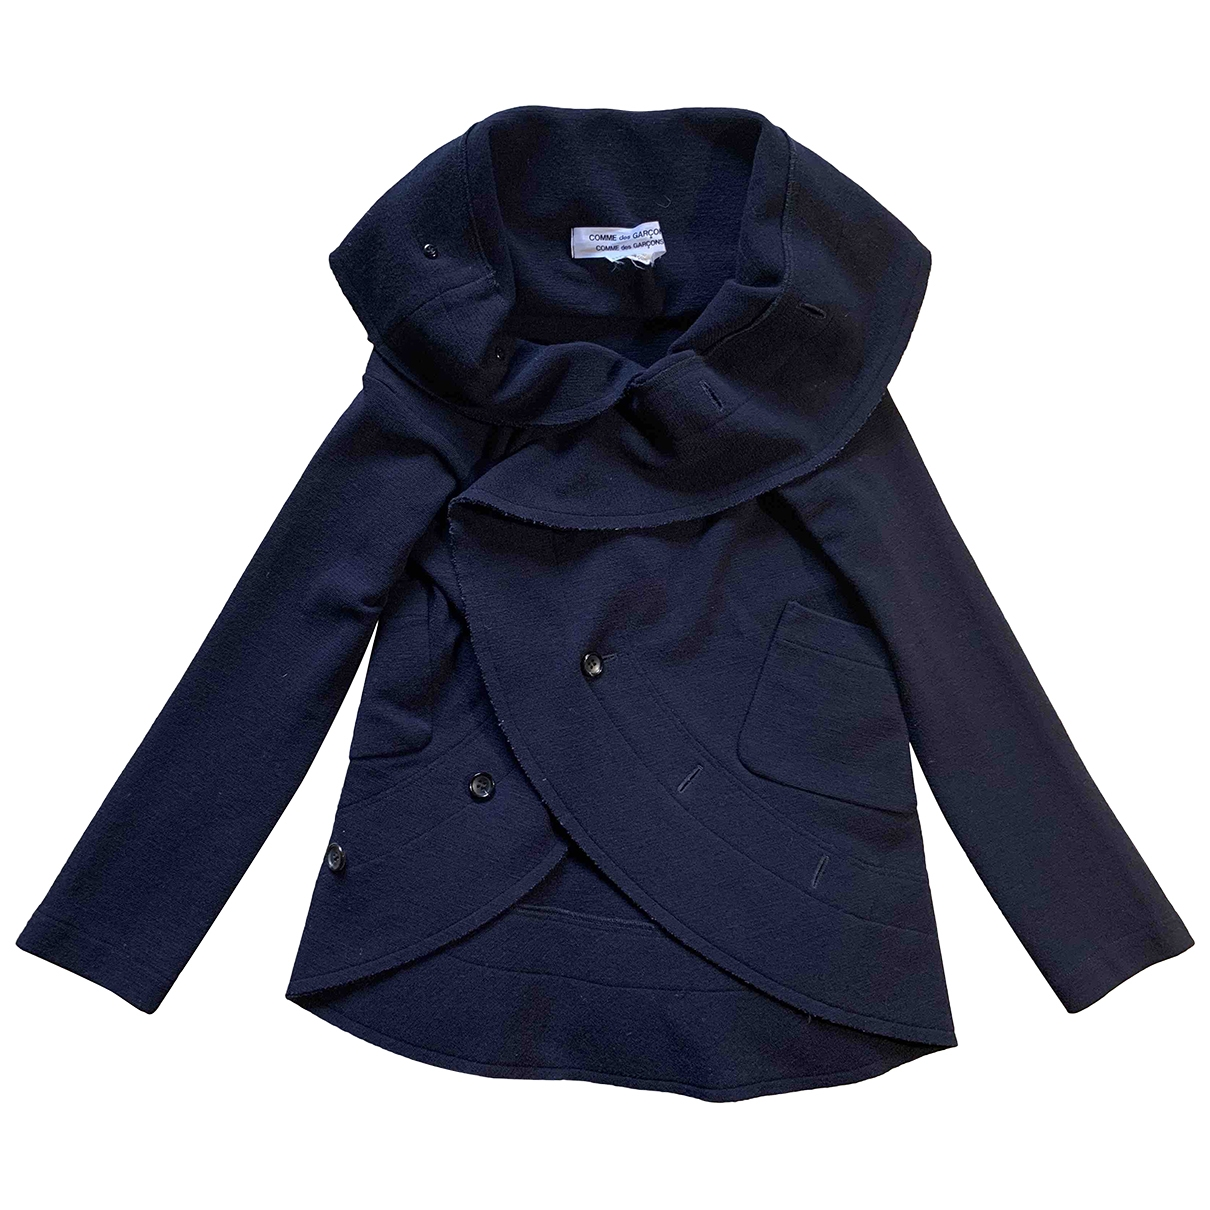 Comme Des Garcons \N Blue Wool jacket for Women S International